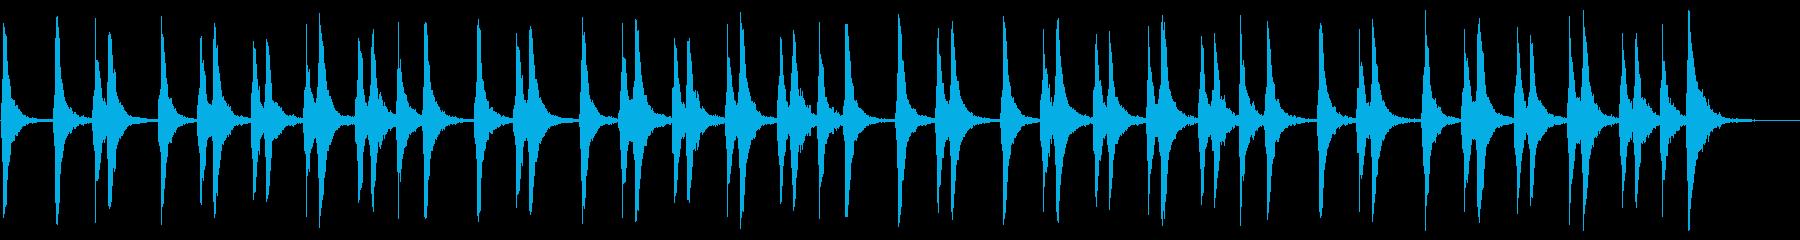 VPや店舗のBGMとして最適の再生済みの波形